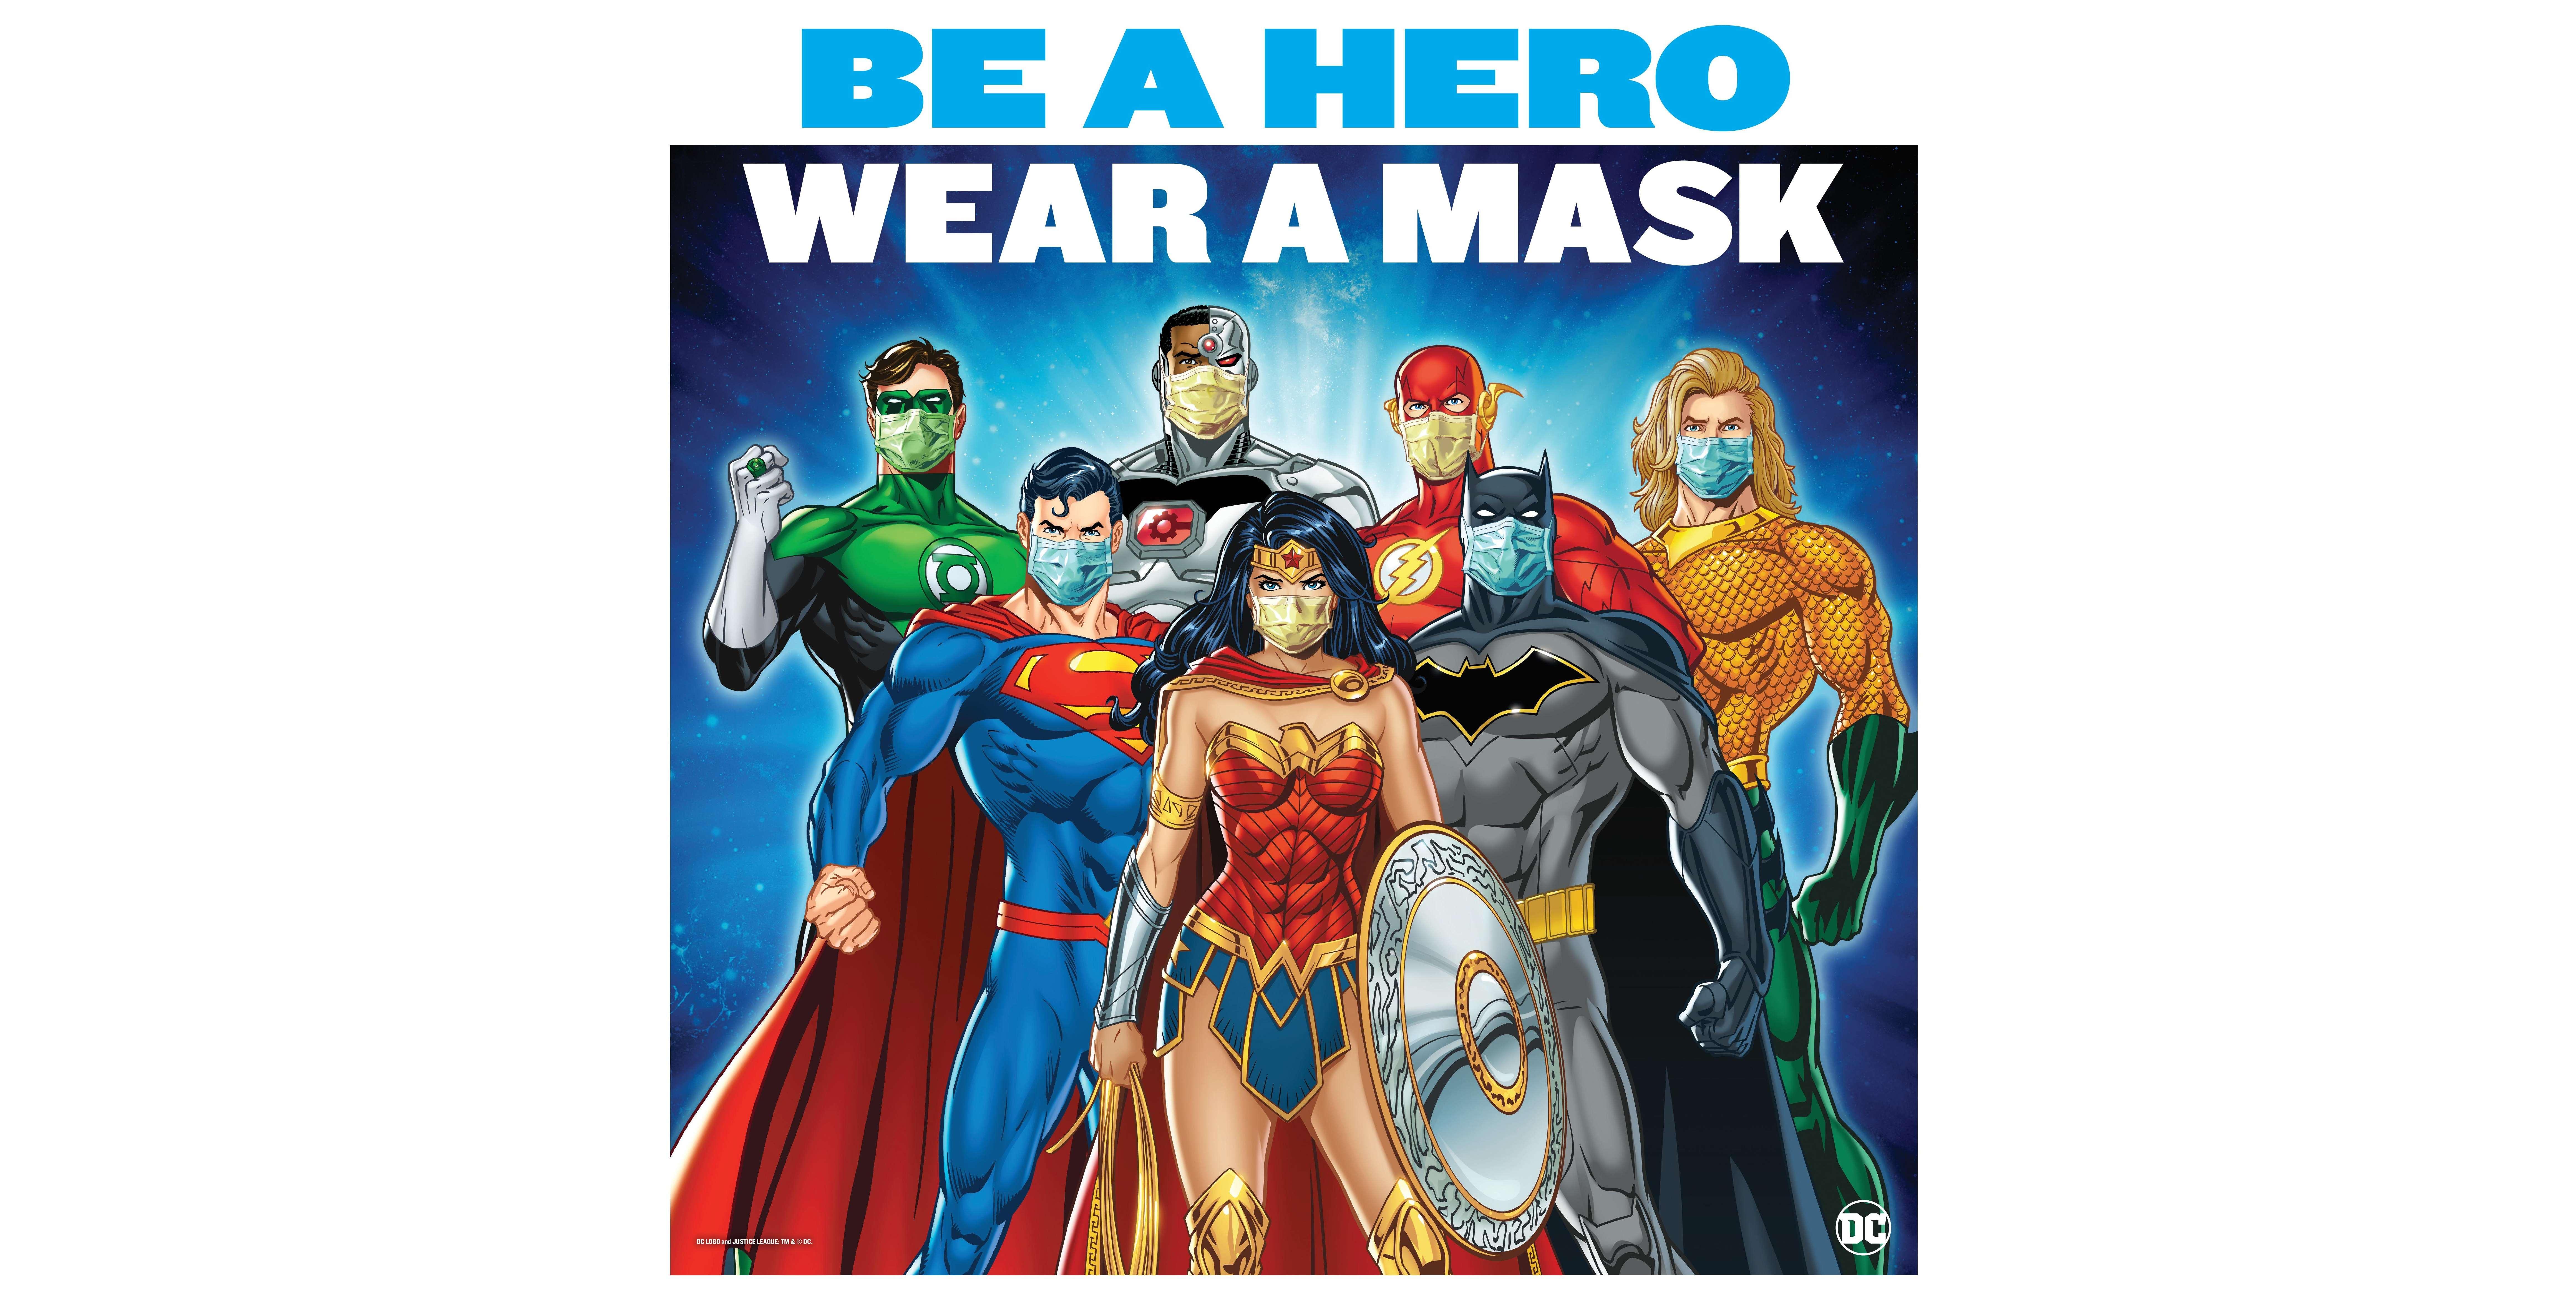 ATT Mask-Up Campaign_FINAL wi Masks-21_v02_r01_x1a (1)